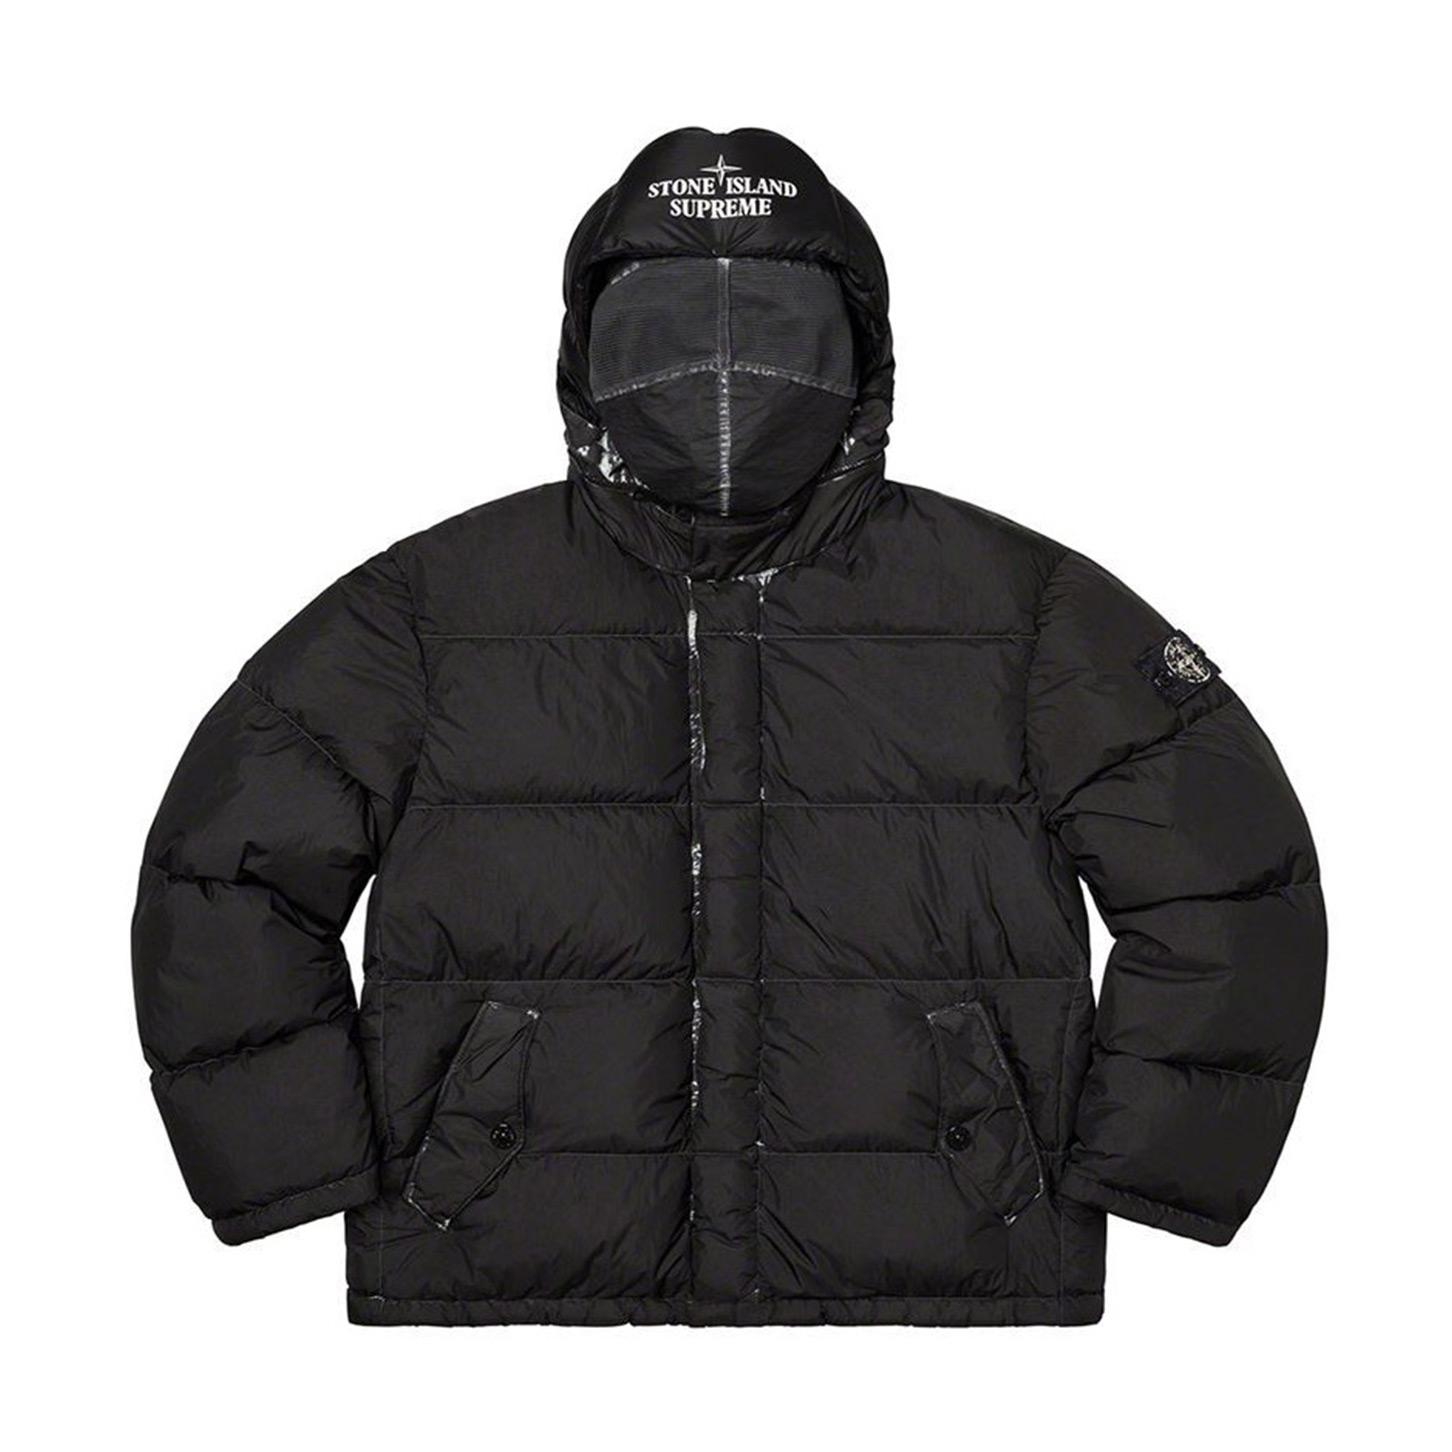 Supreme x Stone Island Painted Camo Crinkle Down Jacket Black 20FW